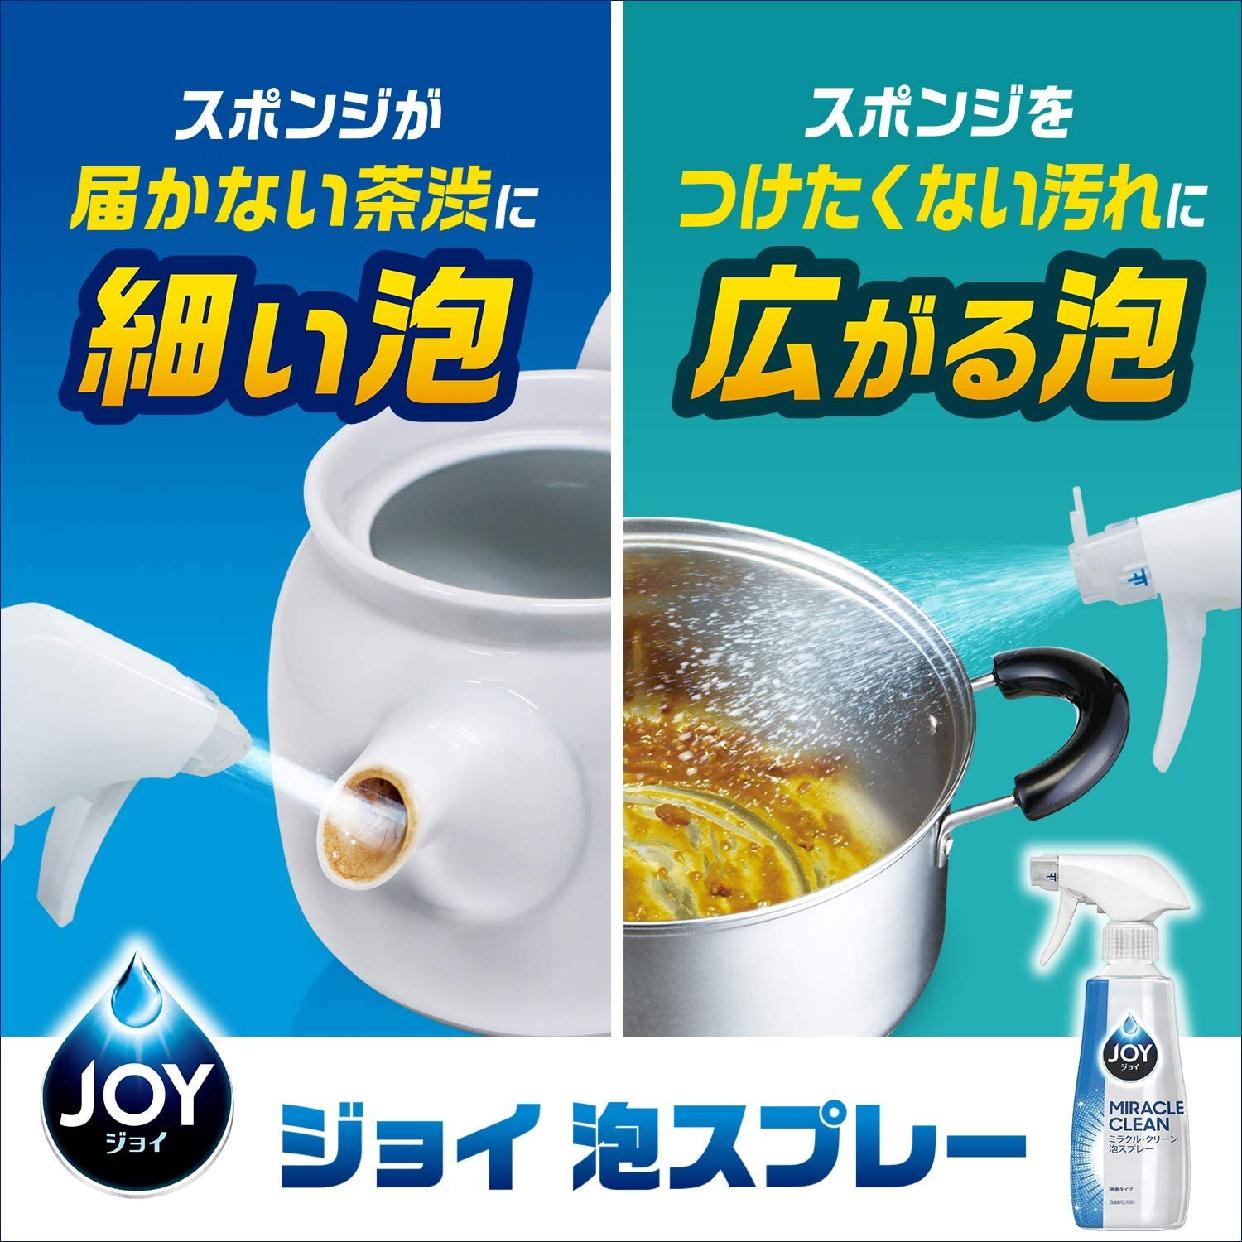 JOY(ジョイ) ミラクルクリーン 泡スプレー 微香タイプの商品画像4